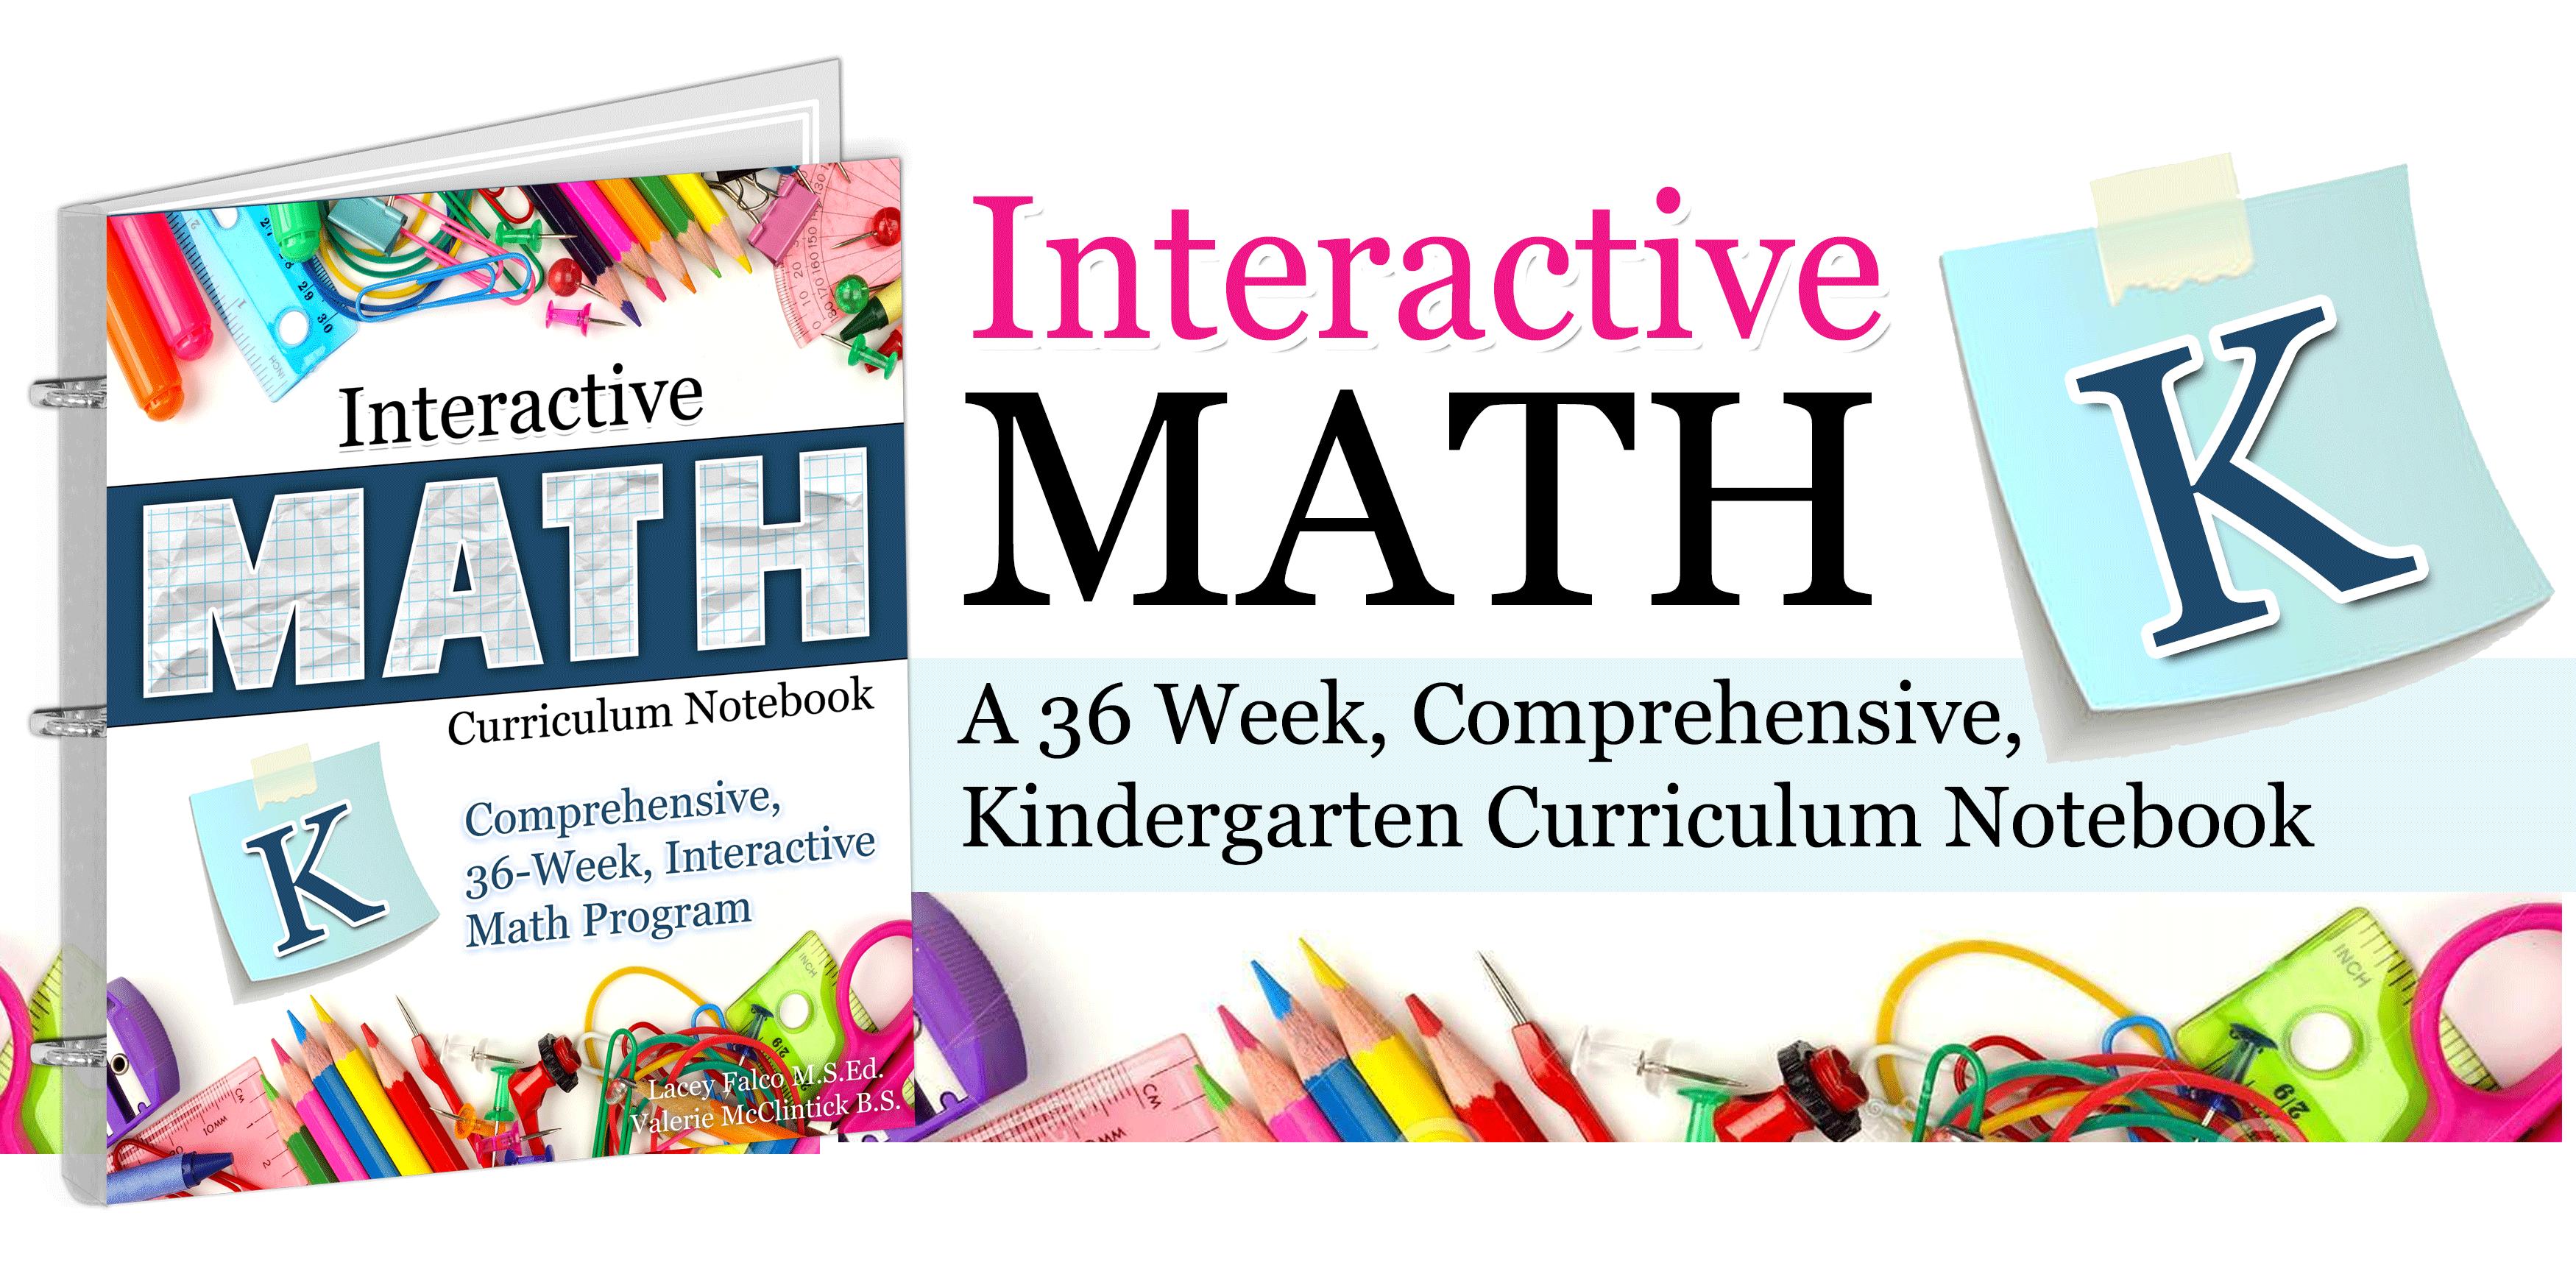 Tips and Tricks for Starting a Math Journal - Kindergarten Mom